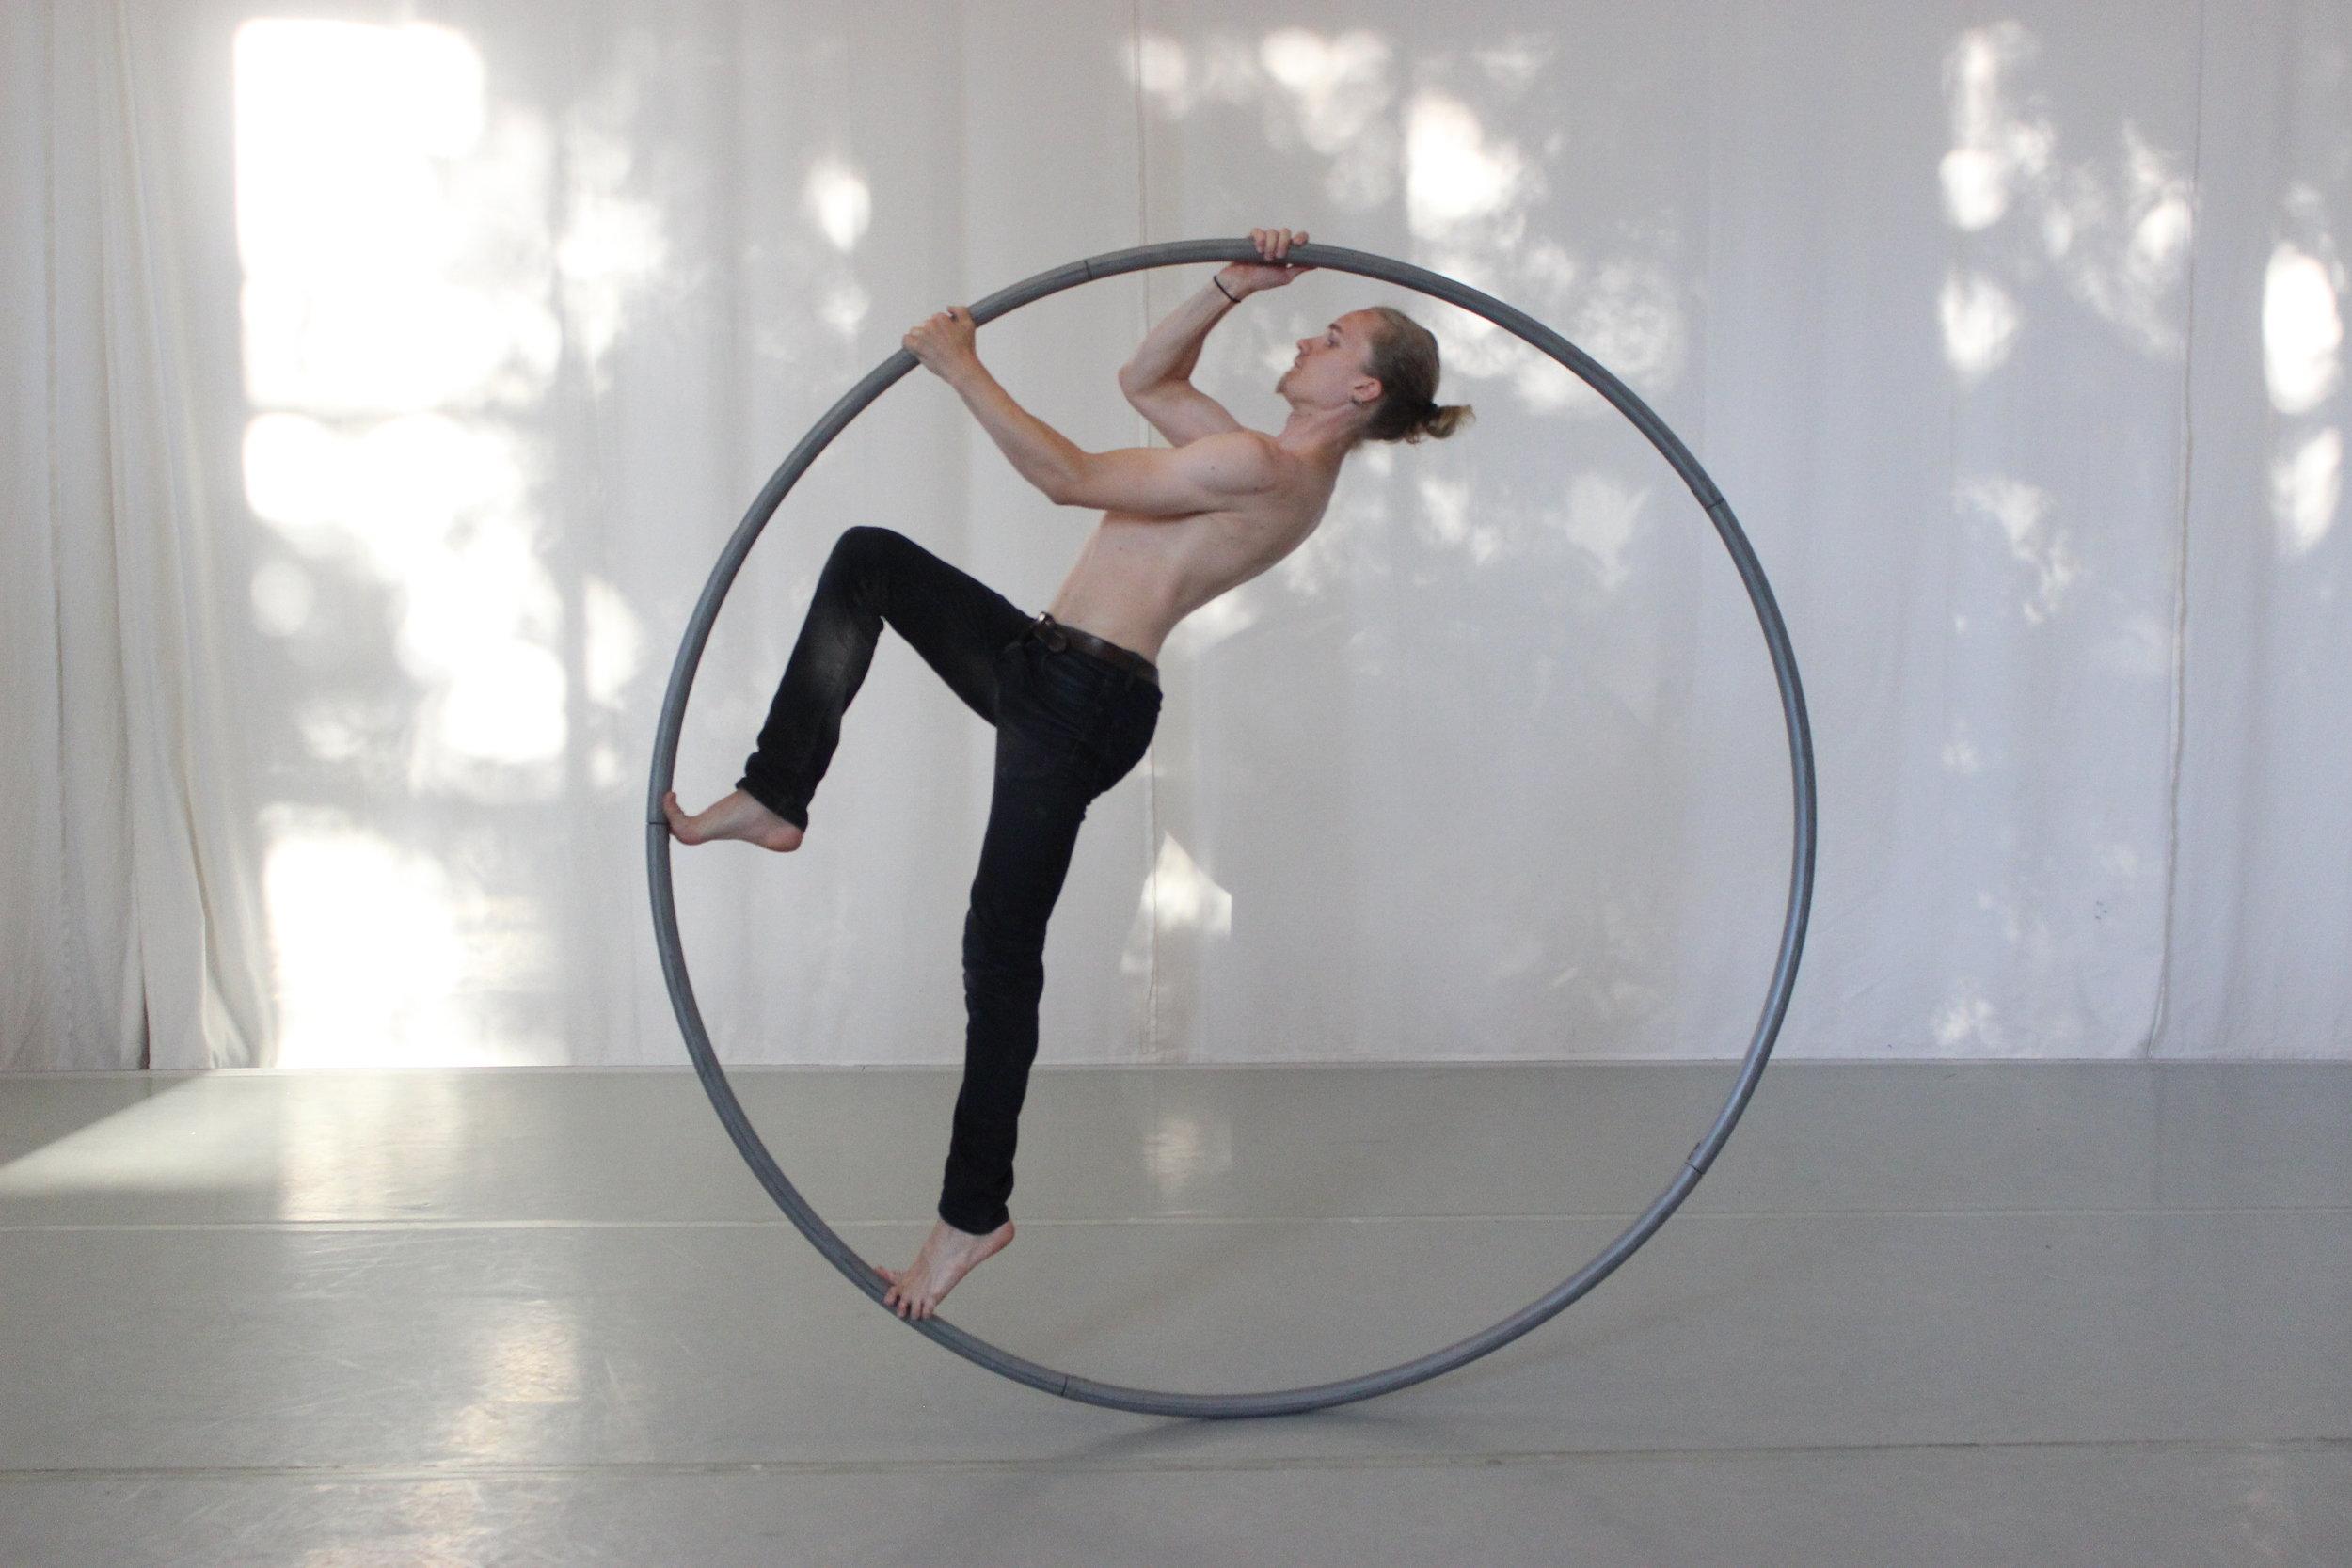 unforgotten_markus-acrobat3.JPG